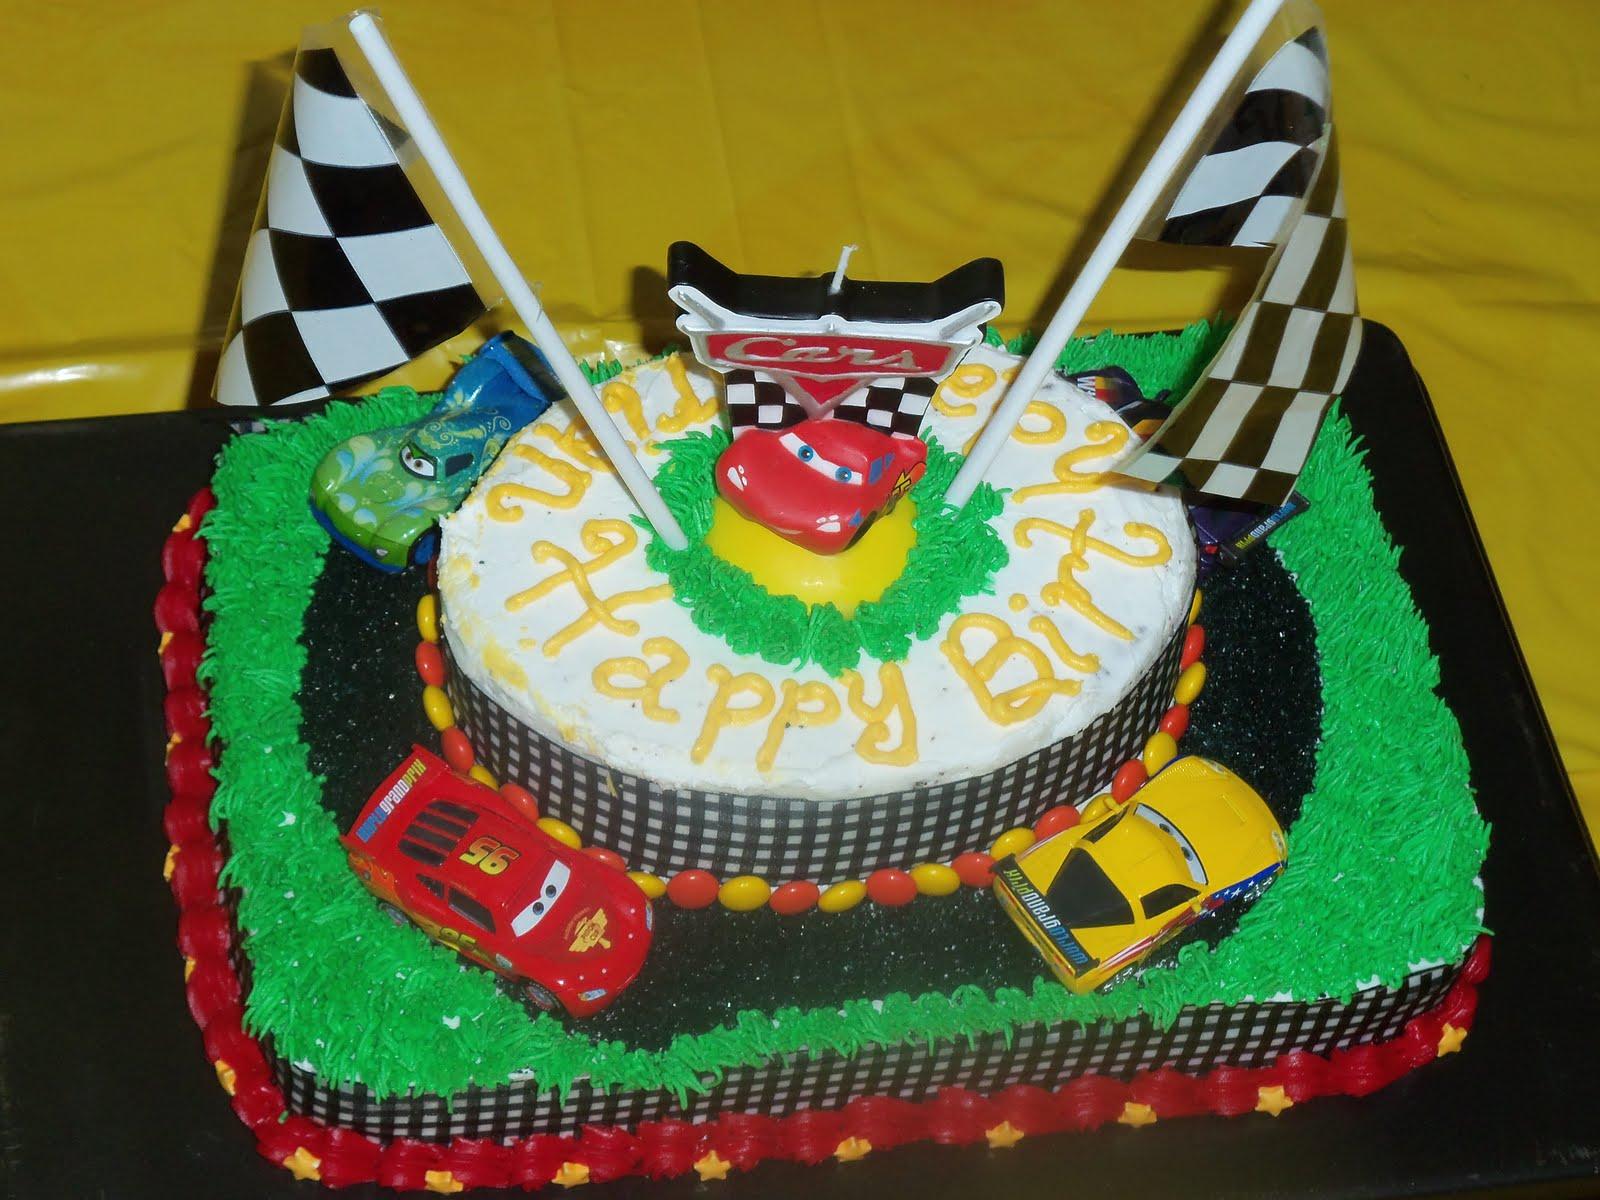 My Charming Cakes Pixar Cars Cake